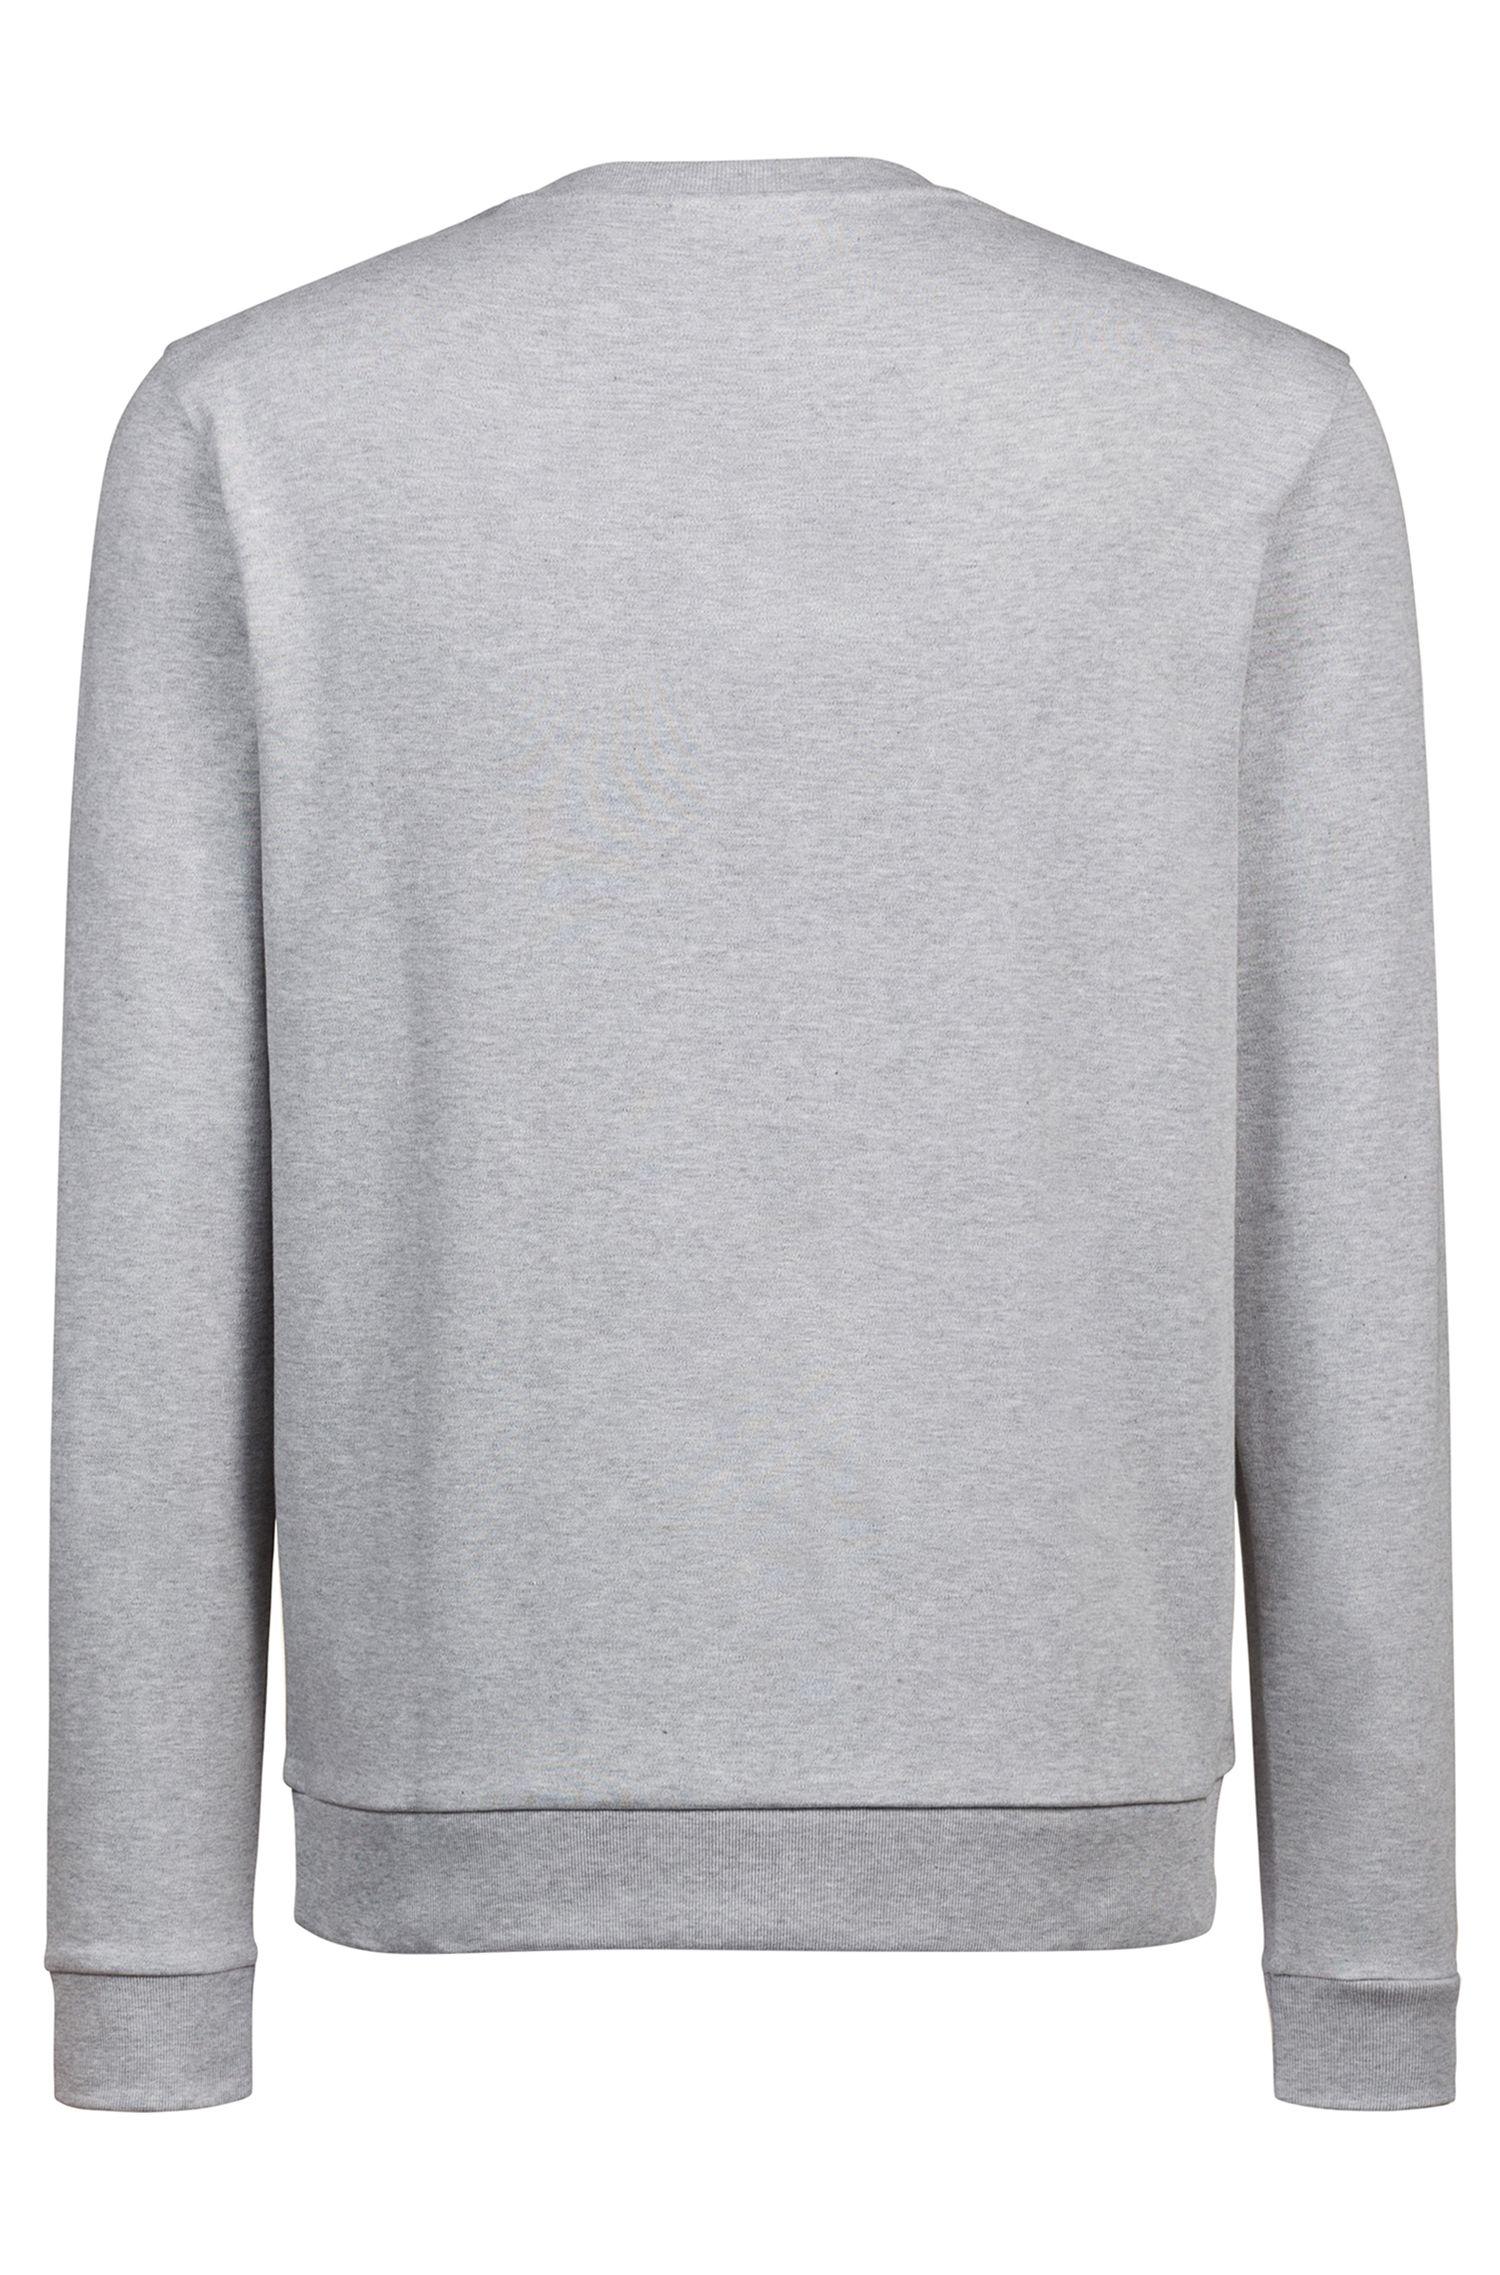 Hugo Boss - Sweatshirt aus  Interlock-Baumwolle mit Reversed-Logo - 4